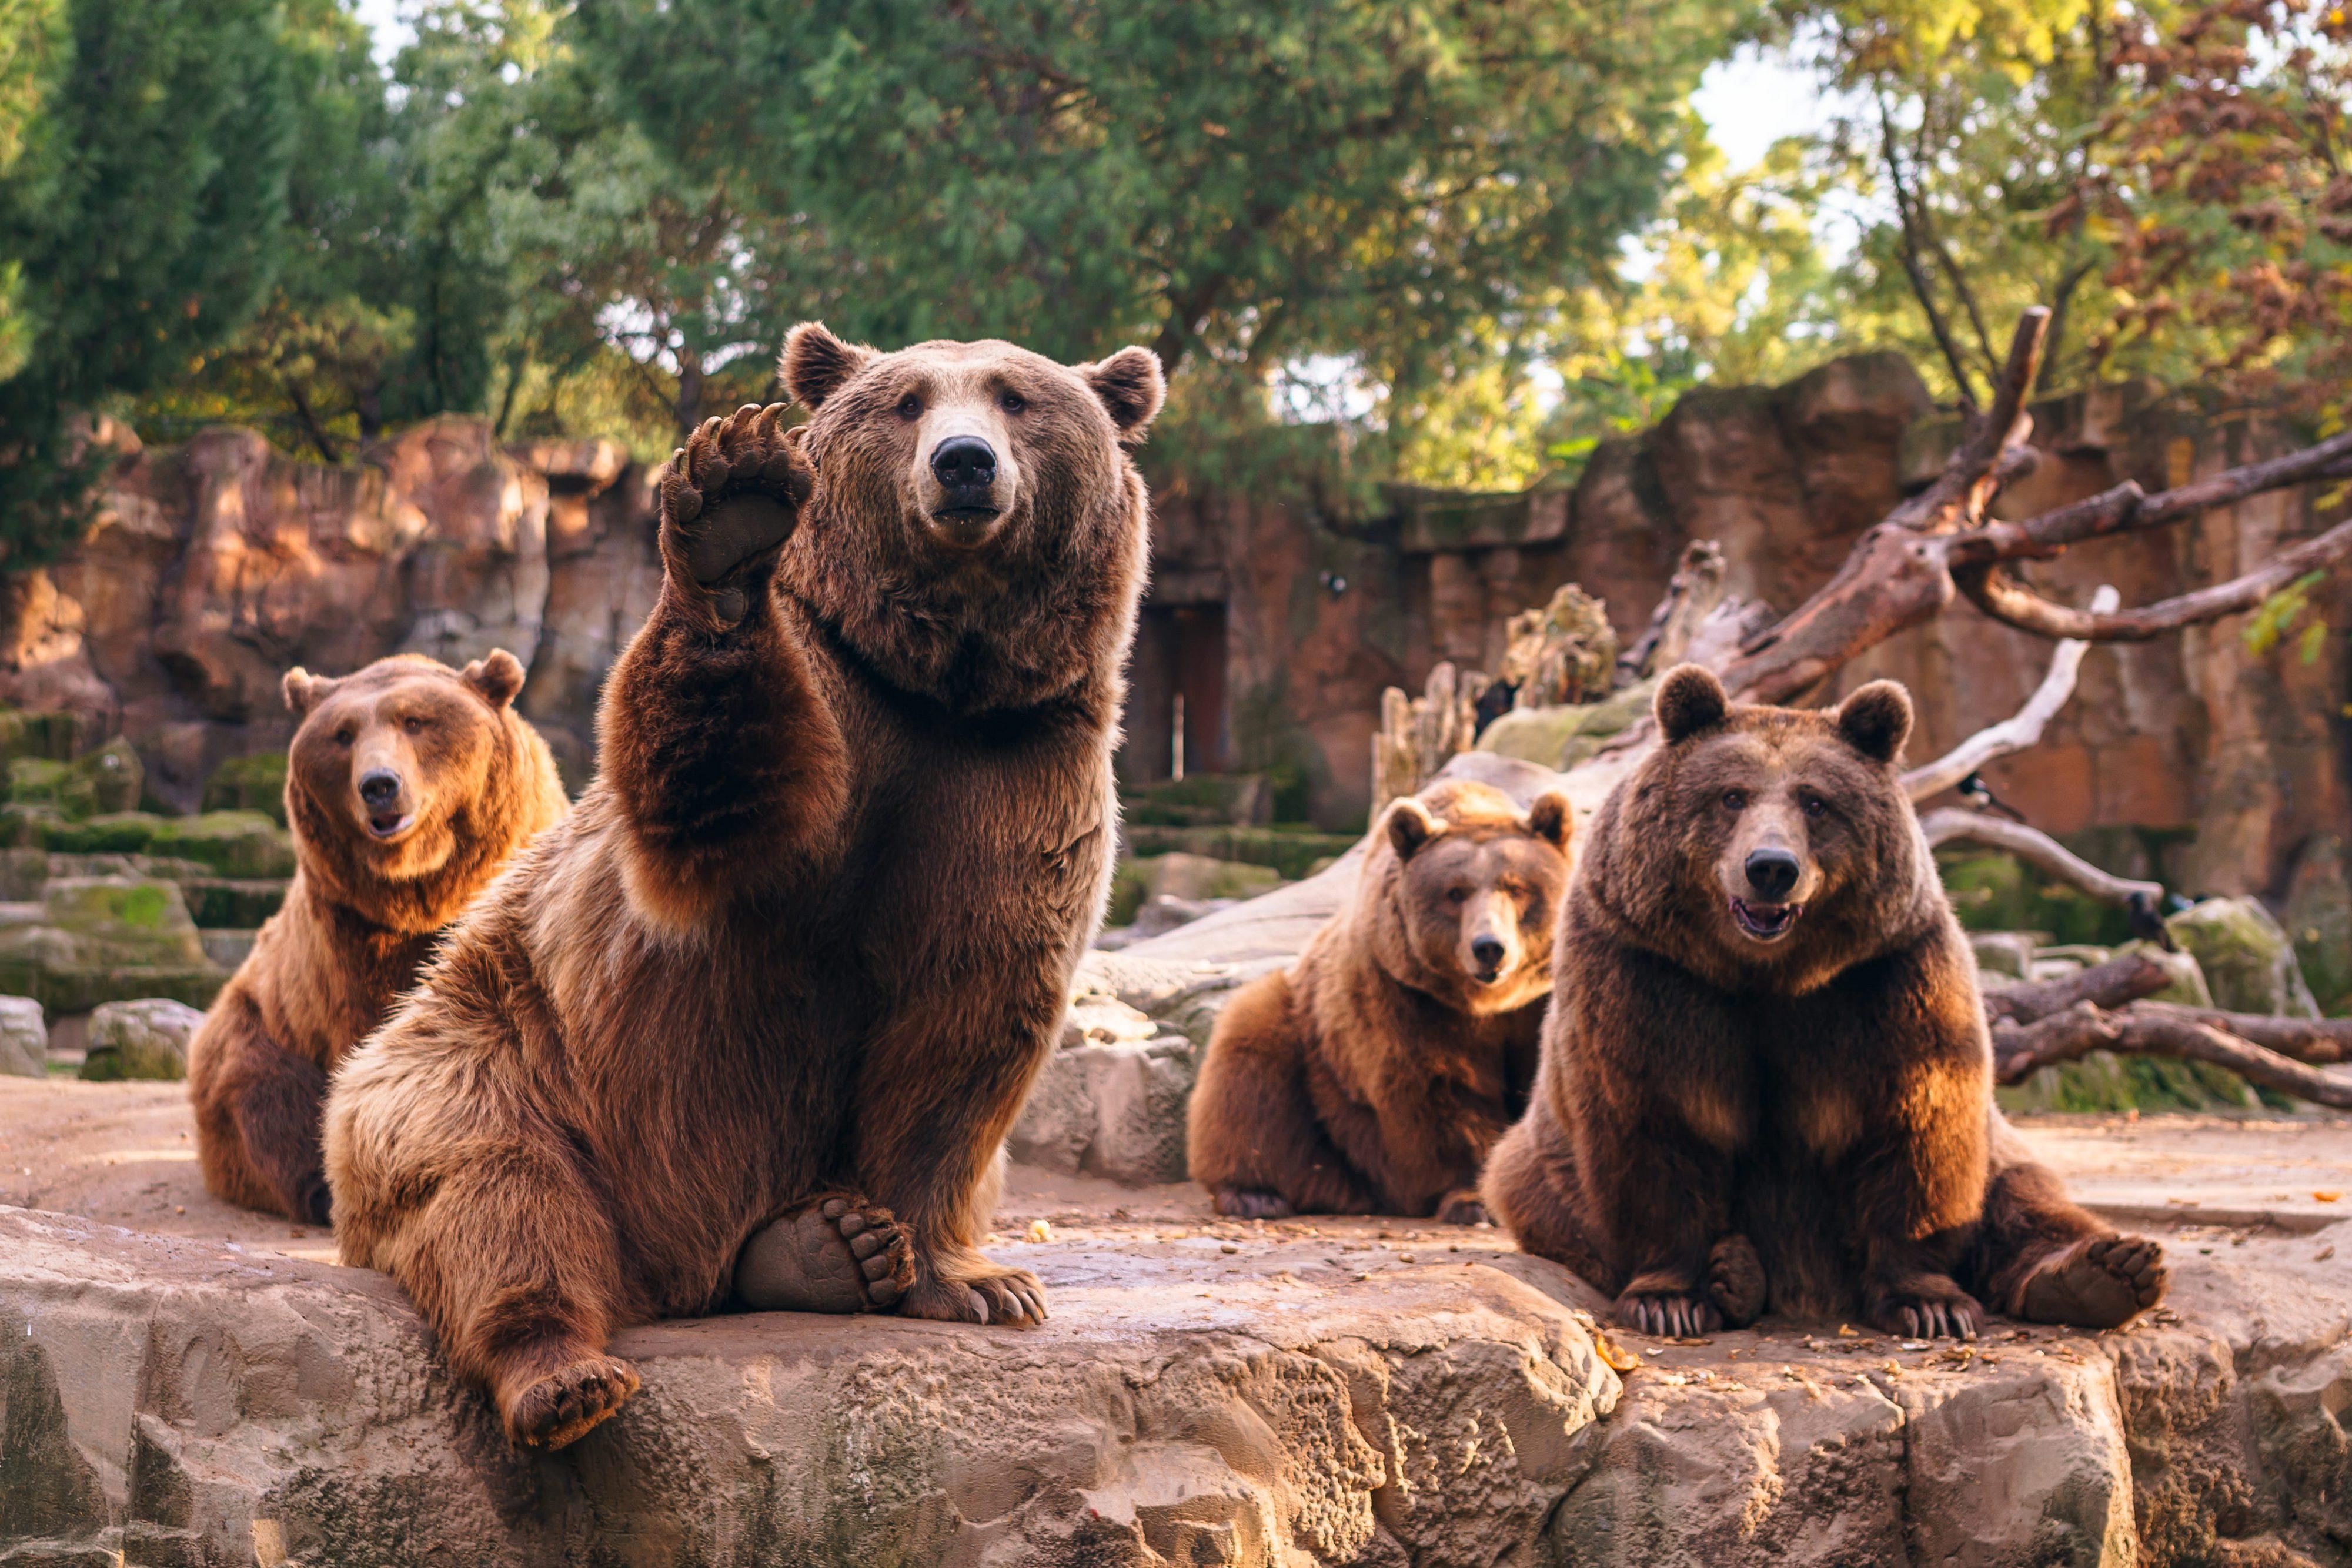 Bear Depth Of Field Zoo Predator Animal 4000x2667